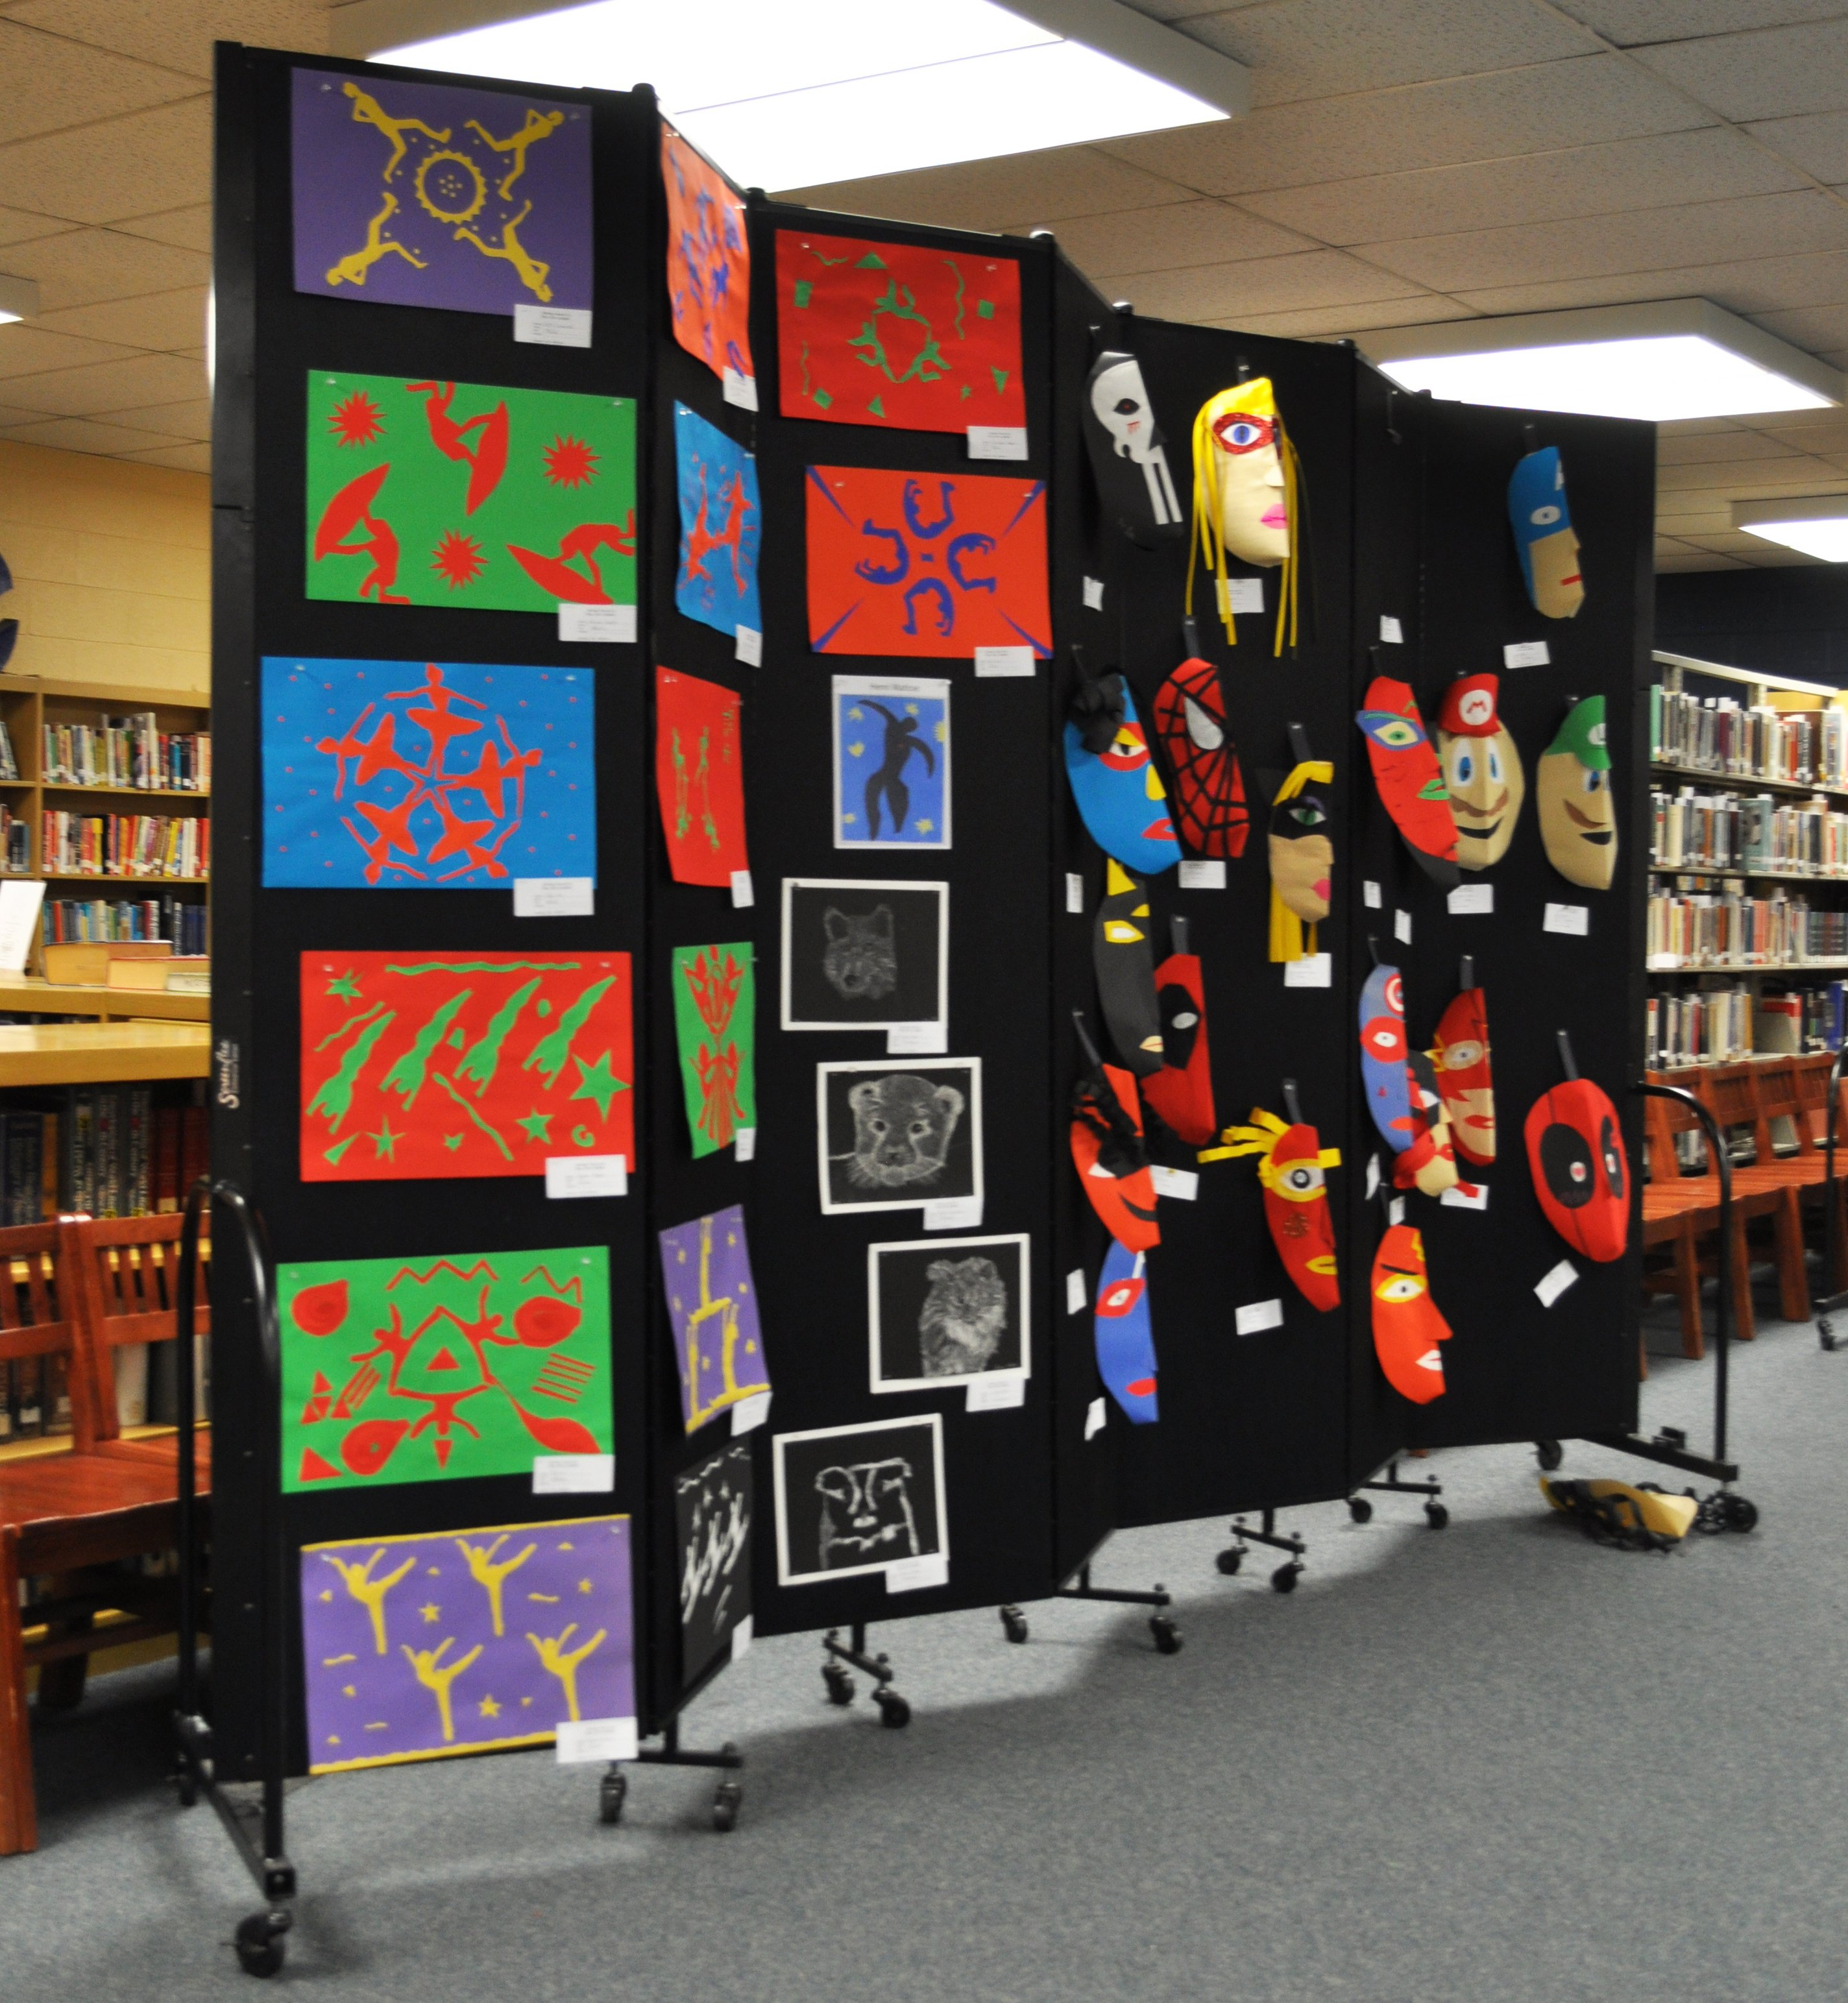 art-display-mchs